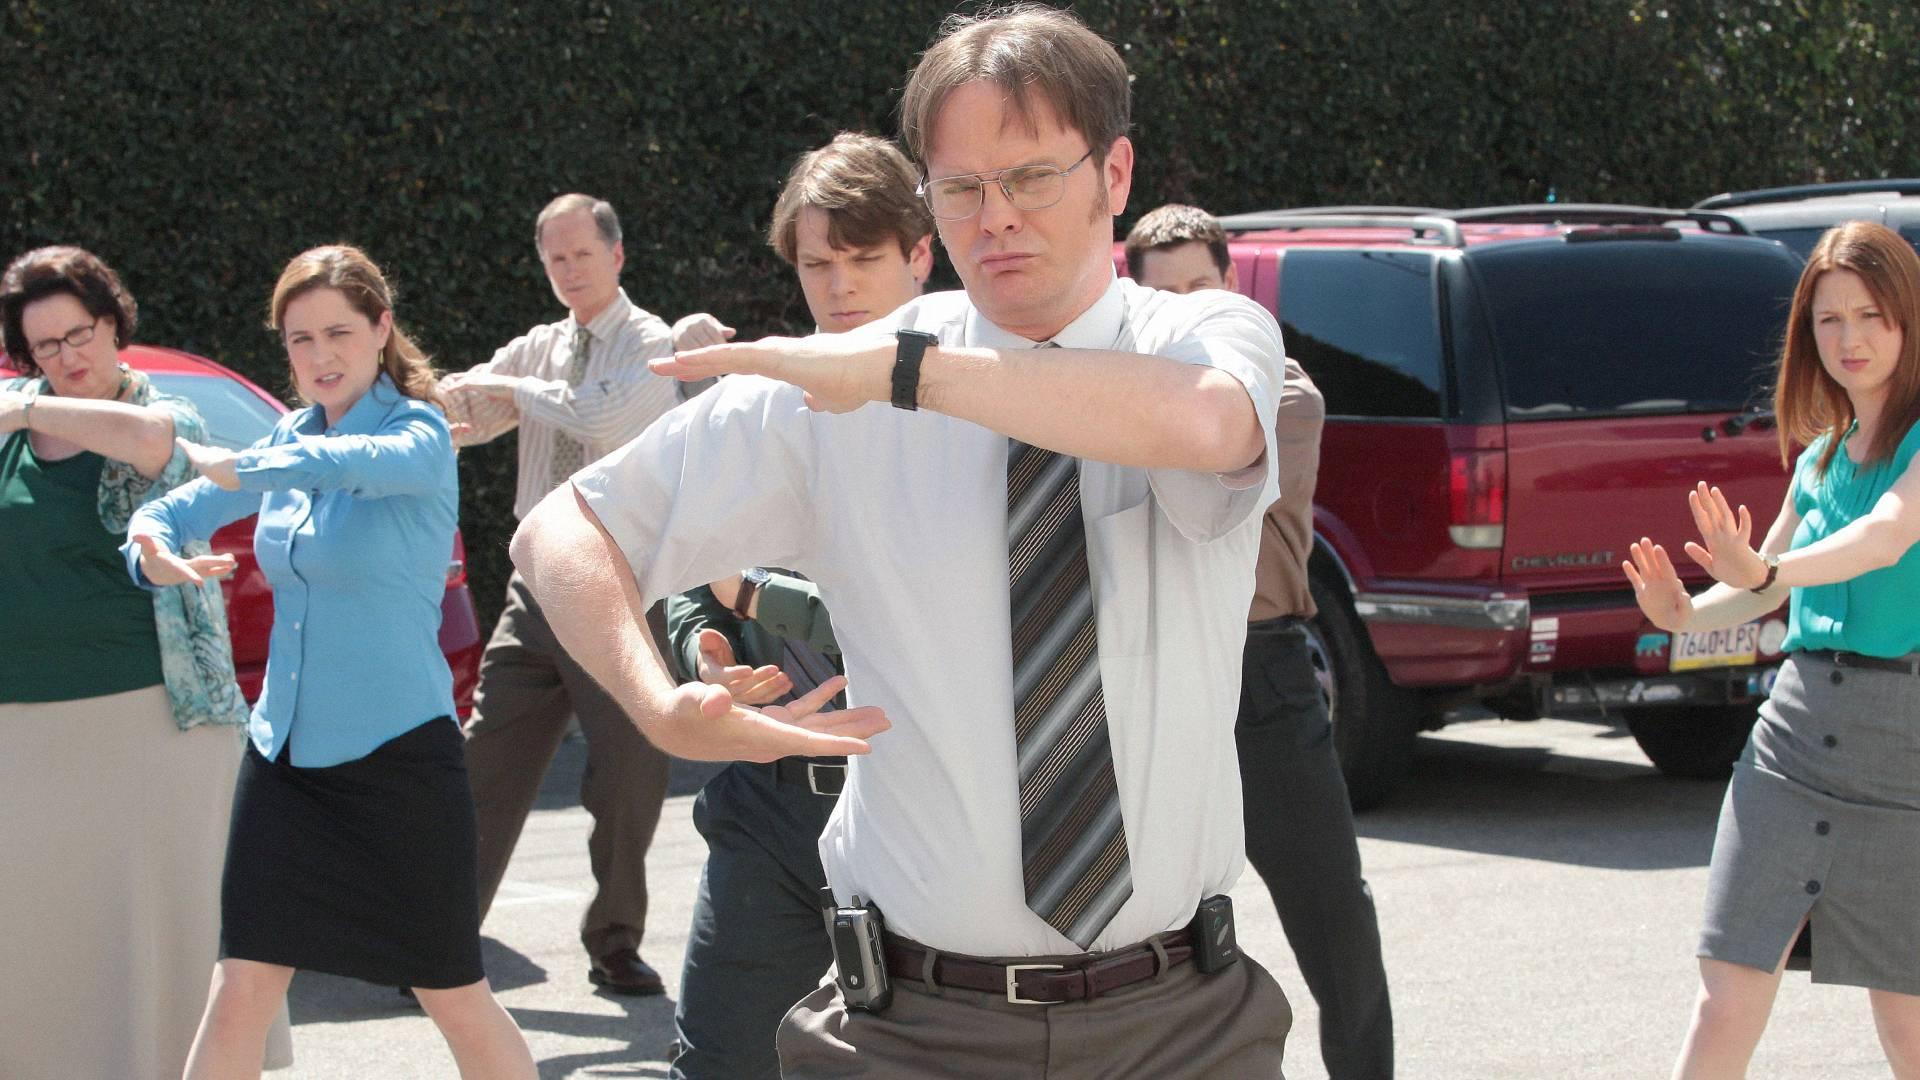 The Office Season 9 Episode 26